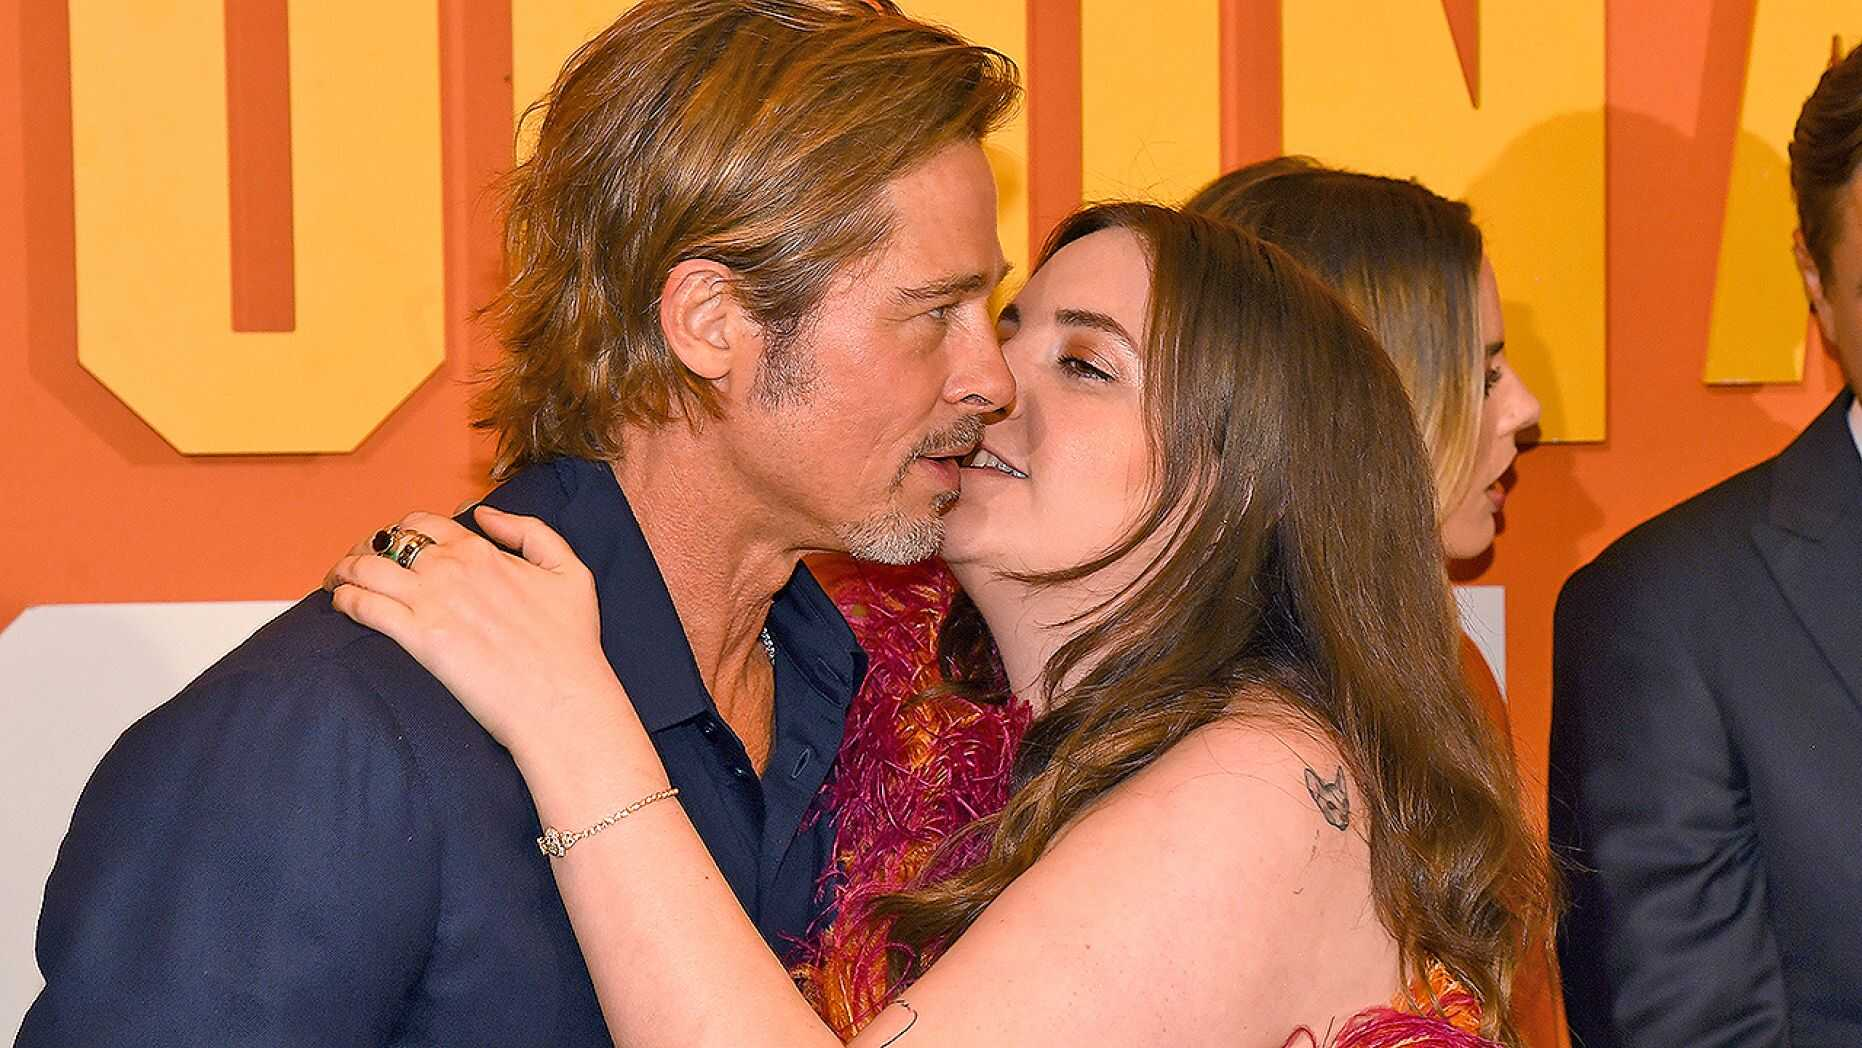 Photo of Lena Dunham awkwardly tries to kiss Brad Pitt at London premiere